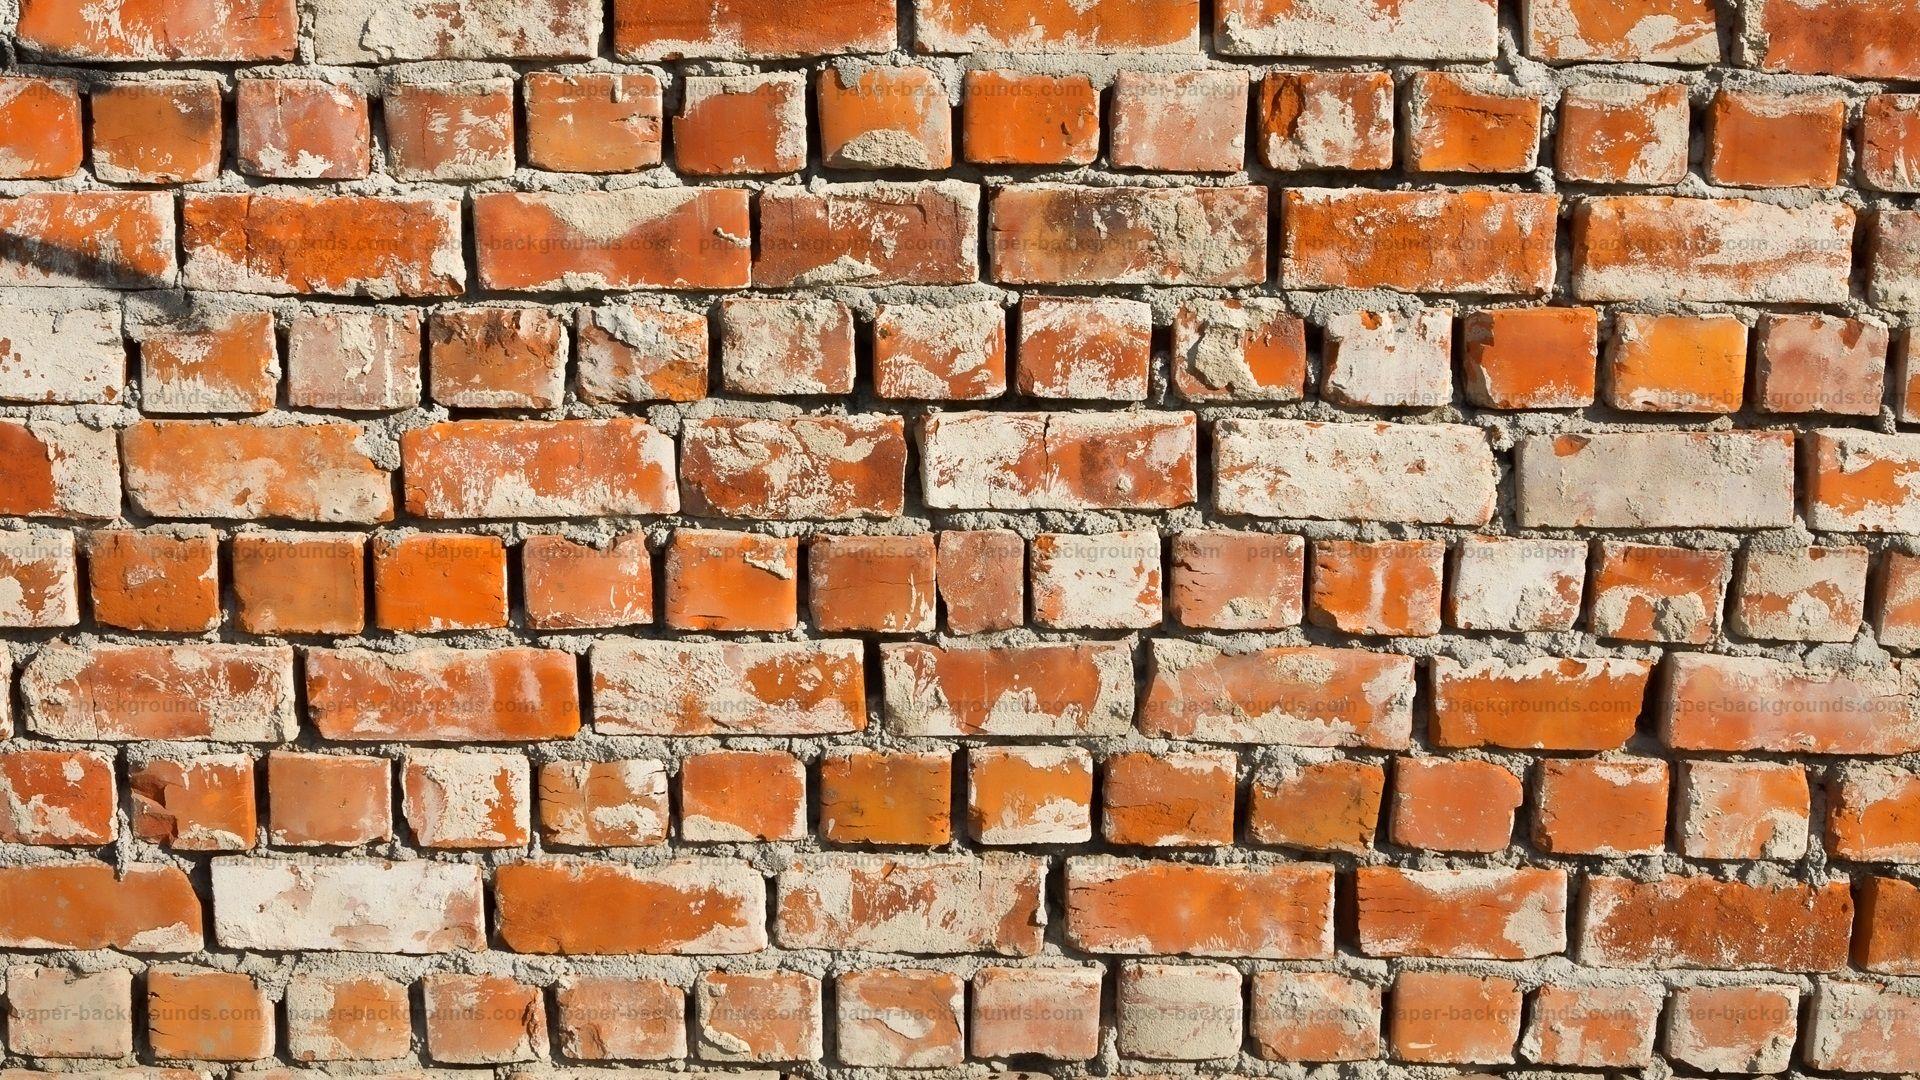 Brick Paper Backdrop hd wallpaper 1080p for pc